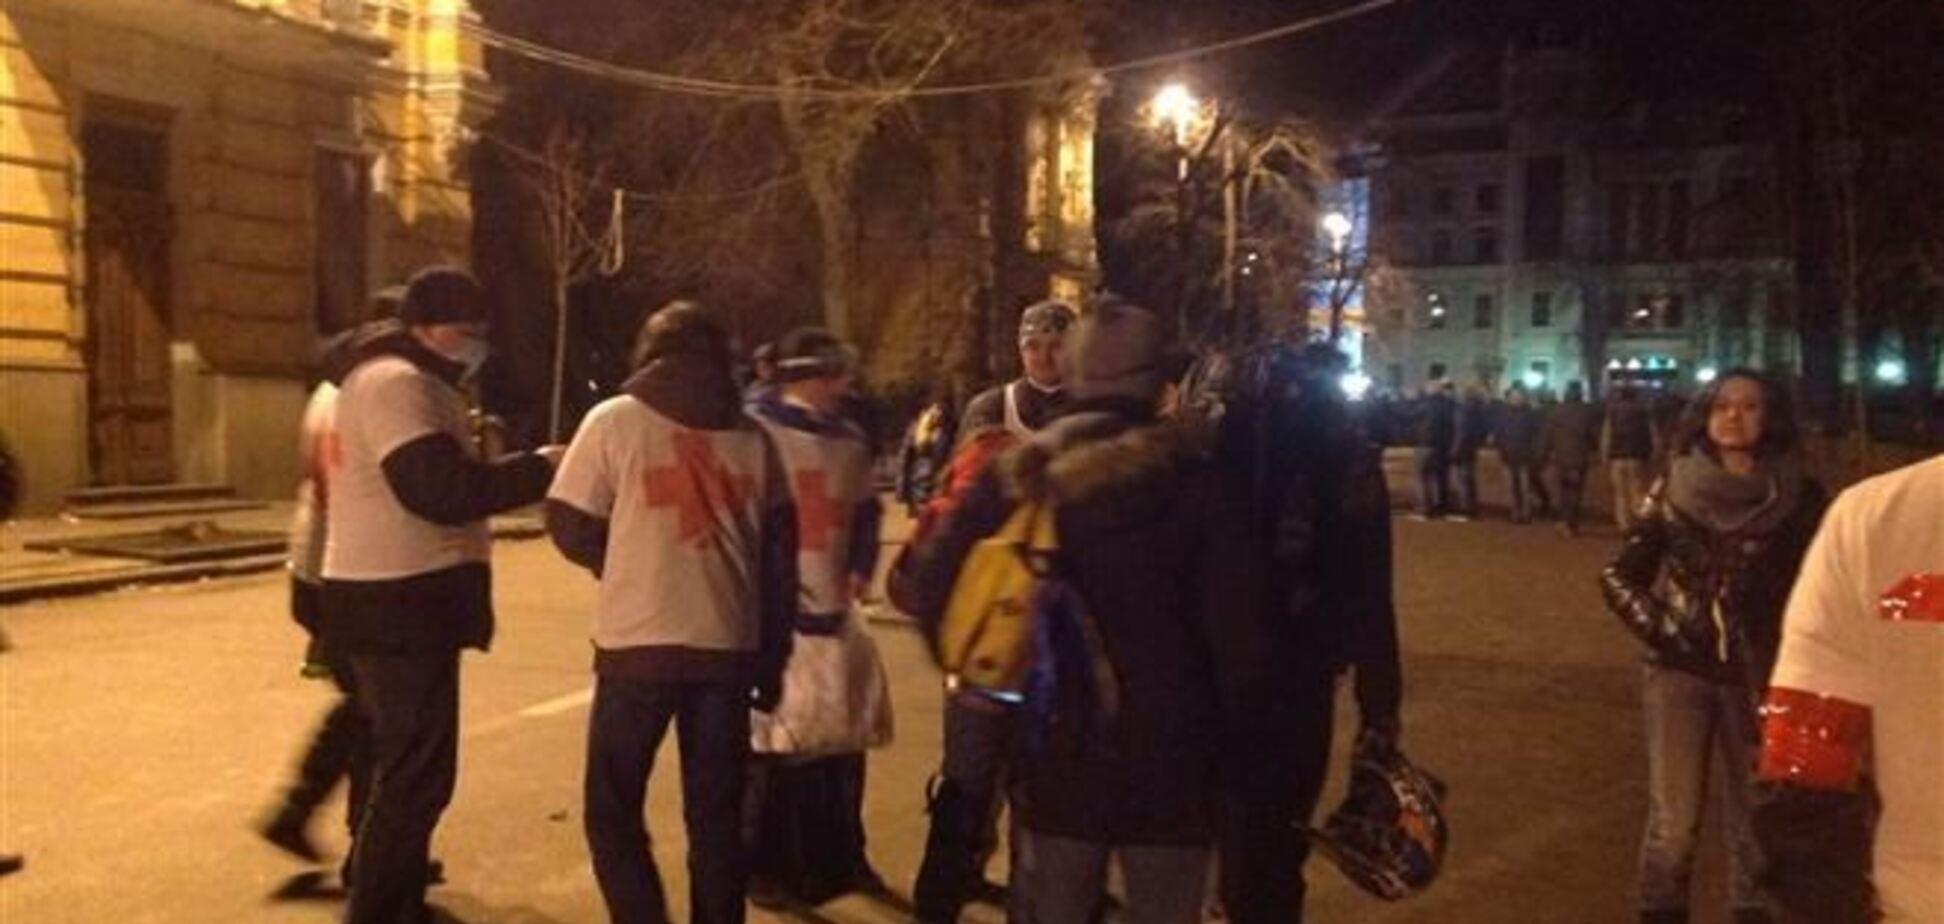 Глава Минюста извинилась перед пострадавшими во время разгона Евромайдана